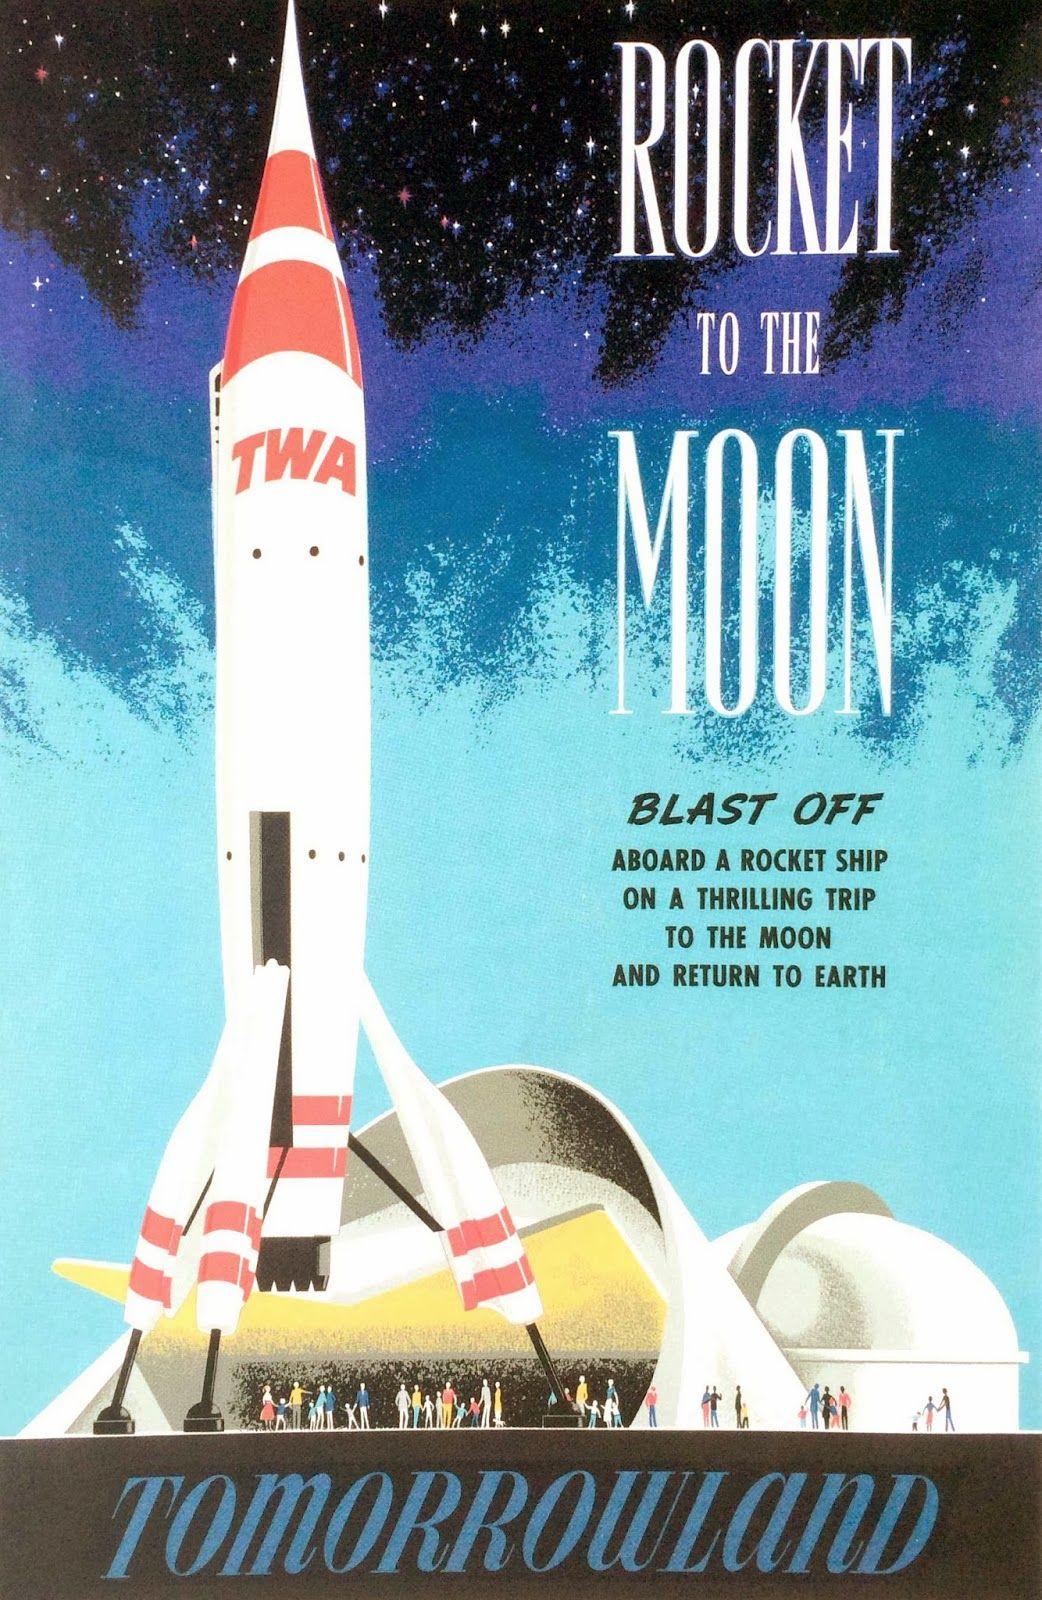 Rocket To The Moon Vintage Poster Retro Disney Vintage Disneyland Disney Posters